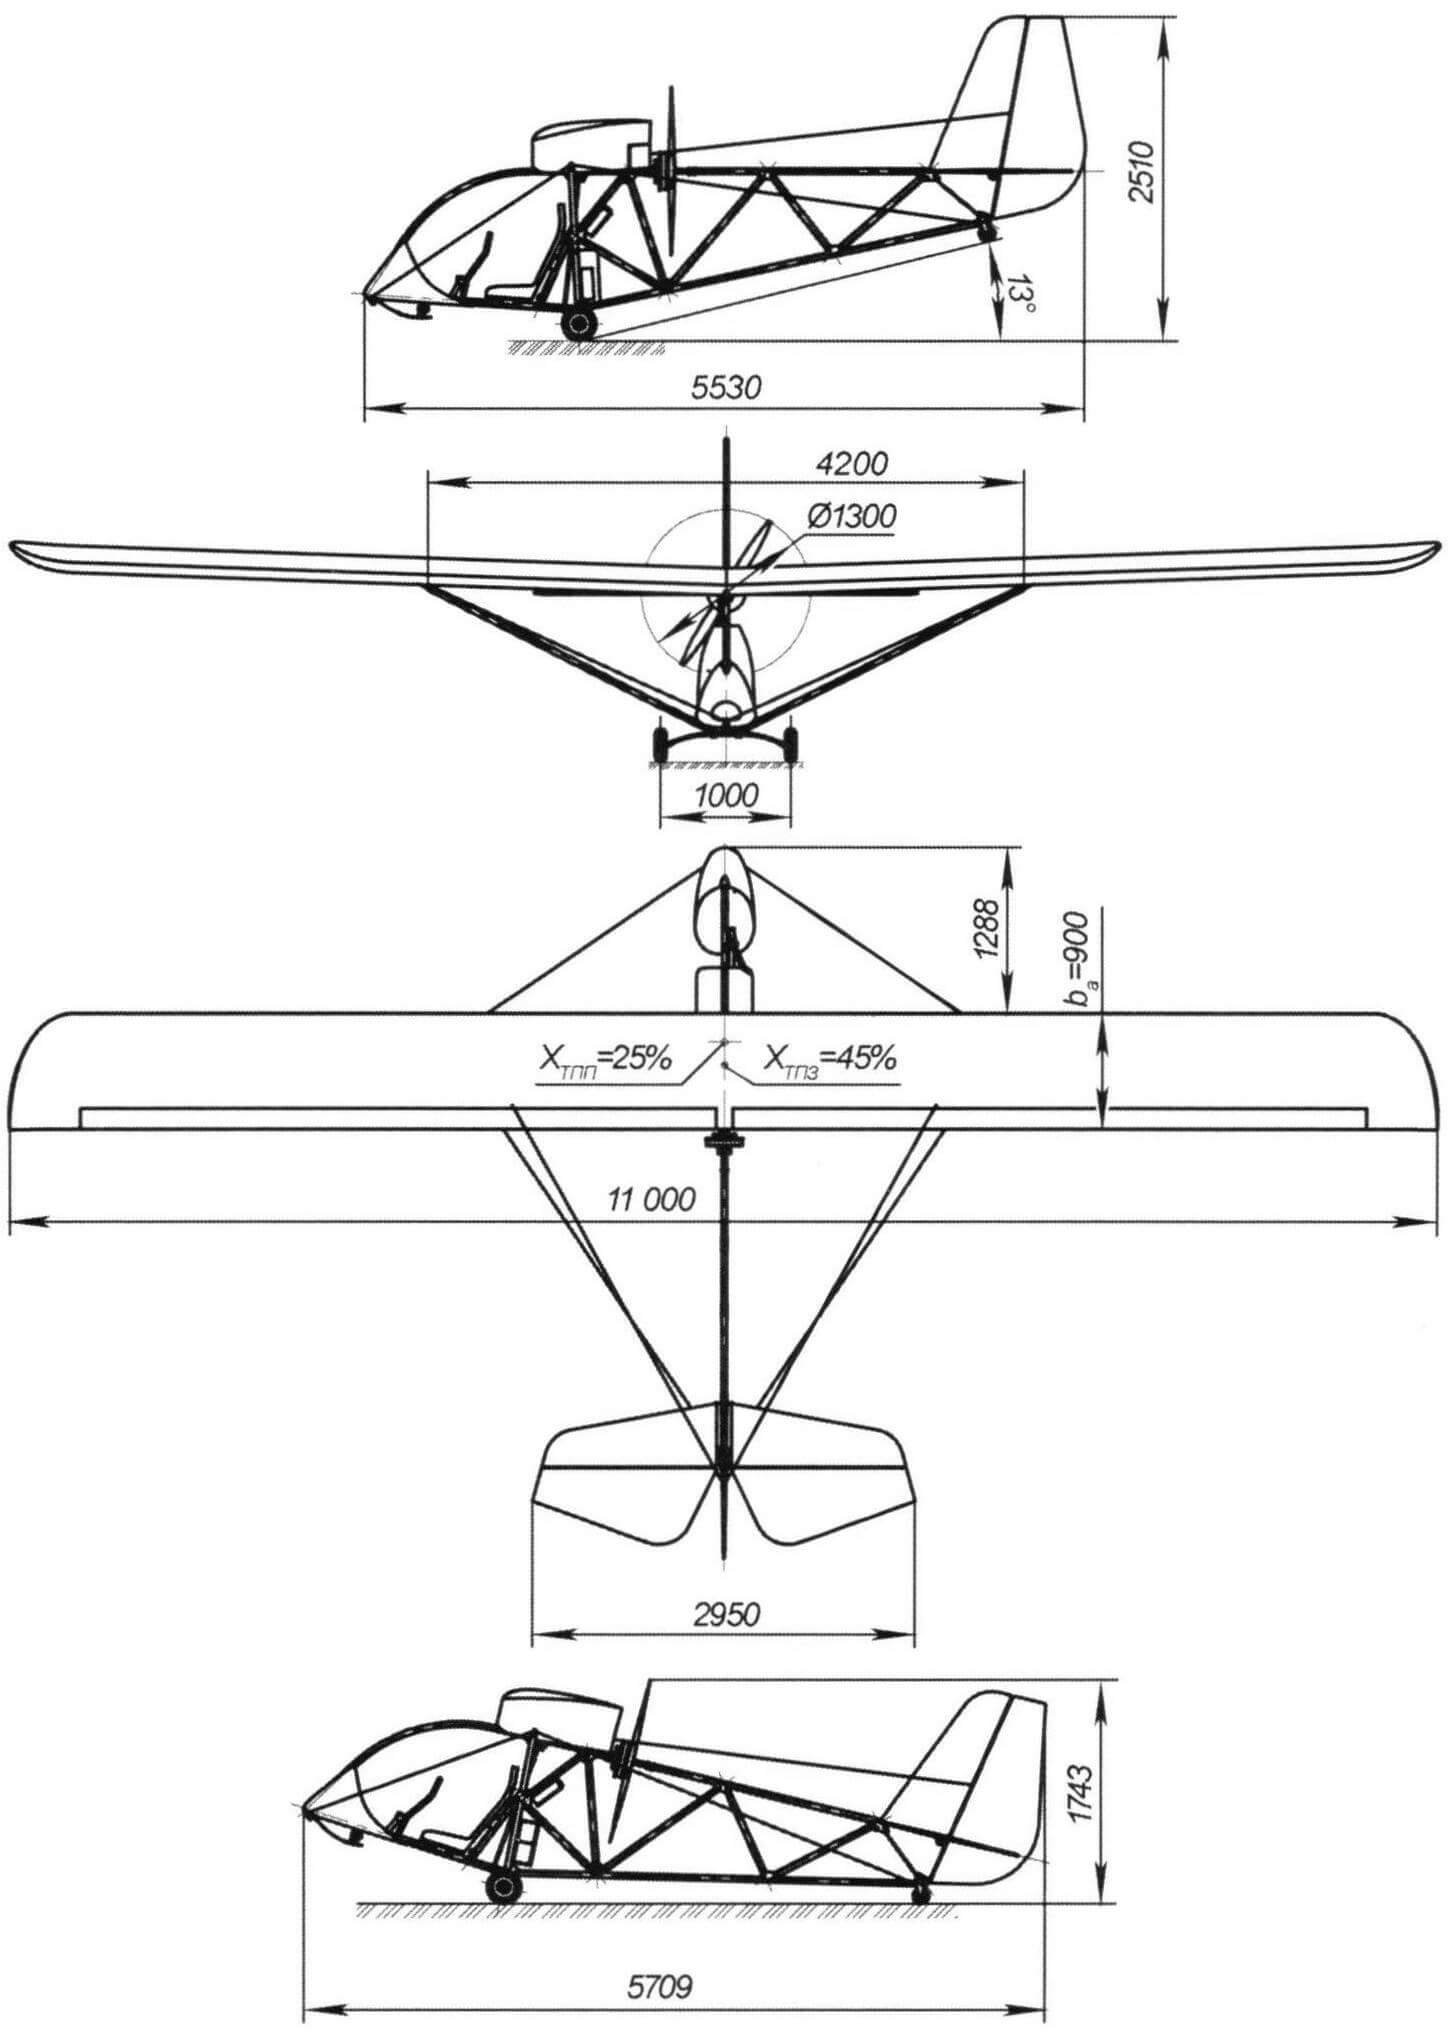 Габаритный чертеж самолета Efly-2